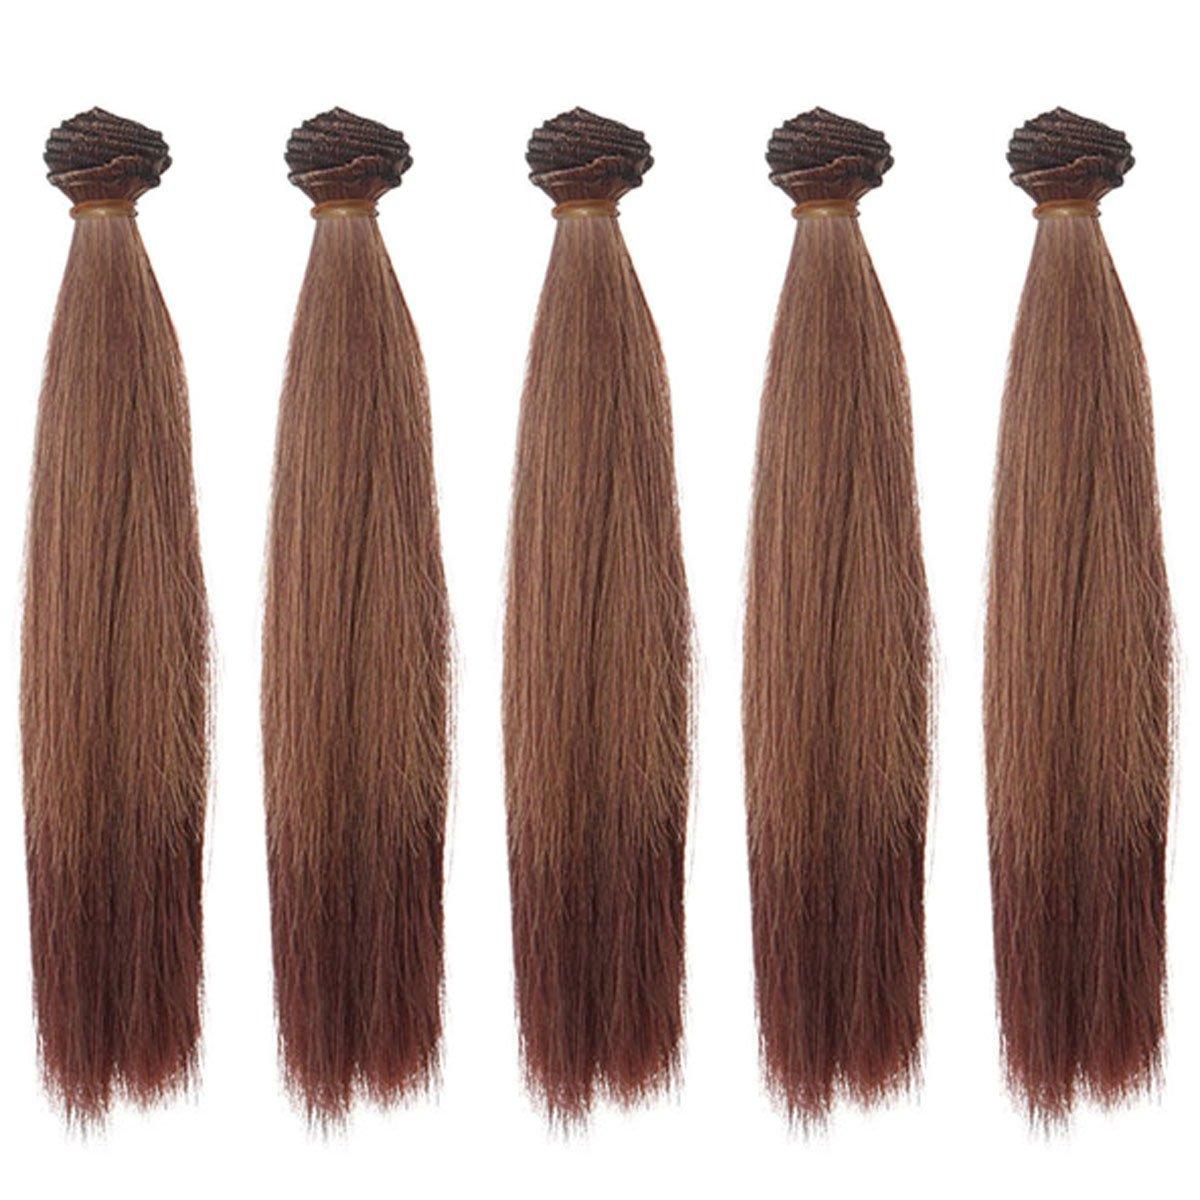 5pcs/lot 25*100cm Straight Light Blonde High Temperature Hair Wefts for DIY BJD Blythe Pullip Doll's Wig Handcraft Materials Leeswig 4336857421